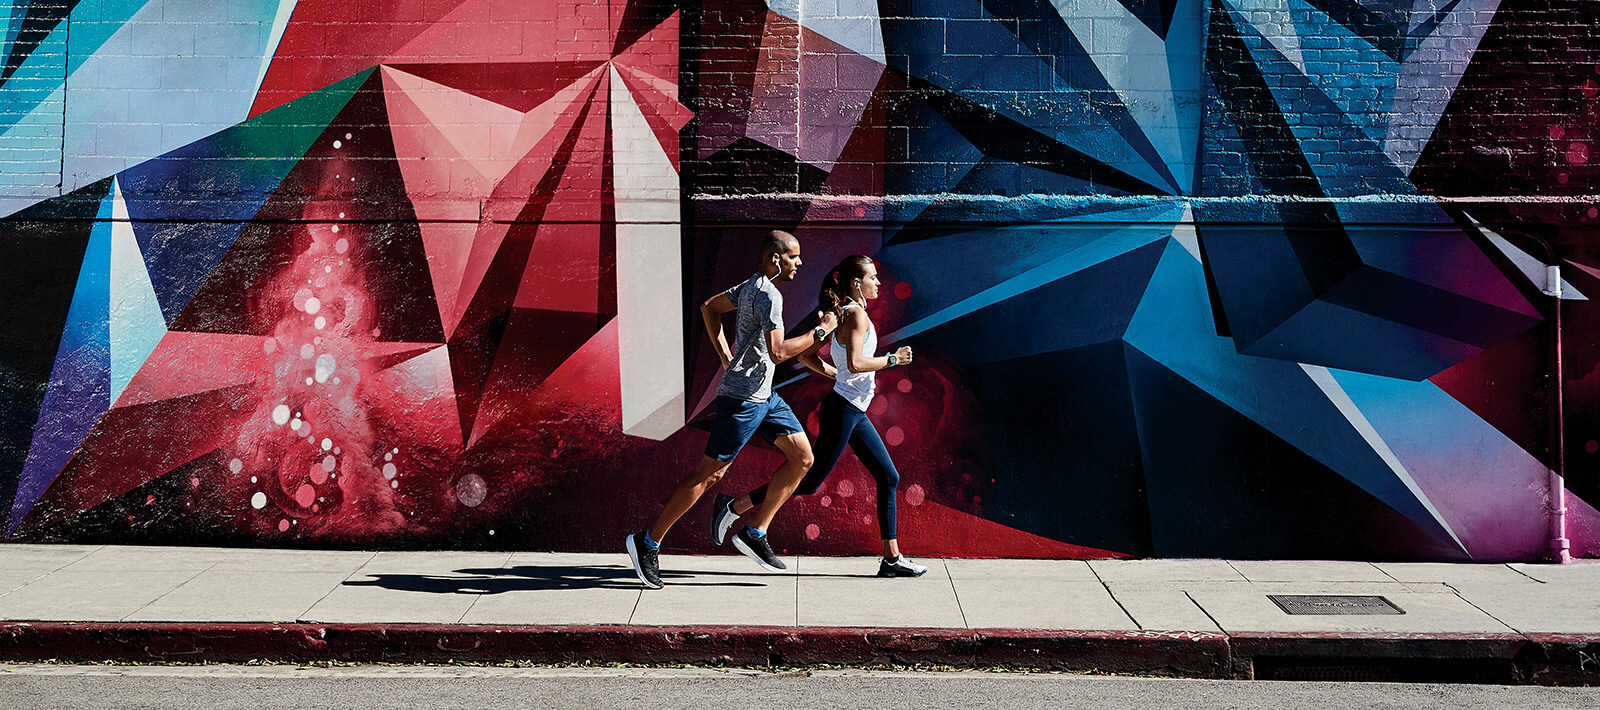 Lari | Olahraga & Kebugaran | Produk | Garmin | Indonesia